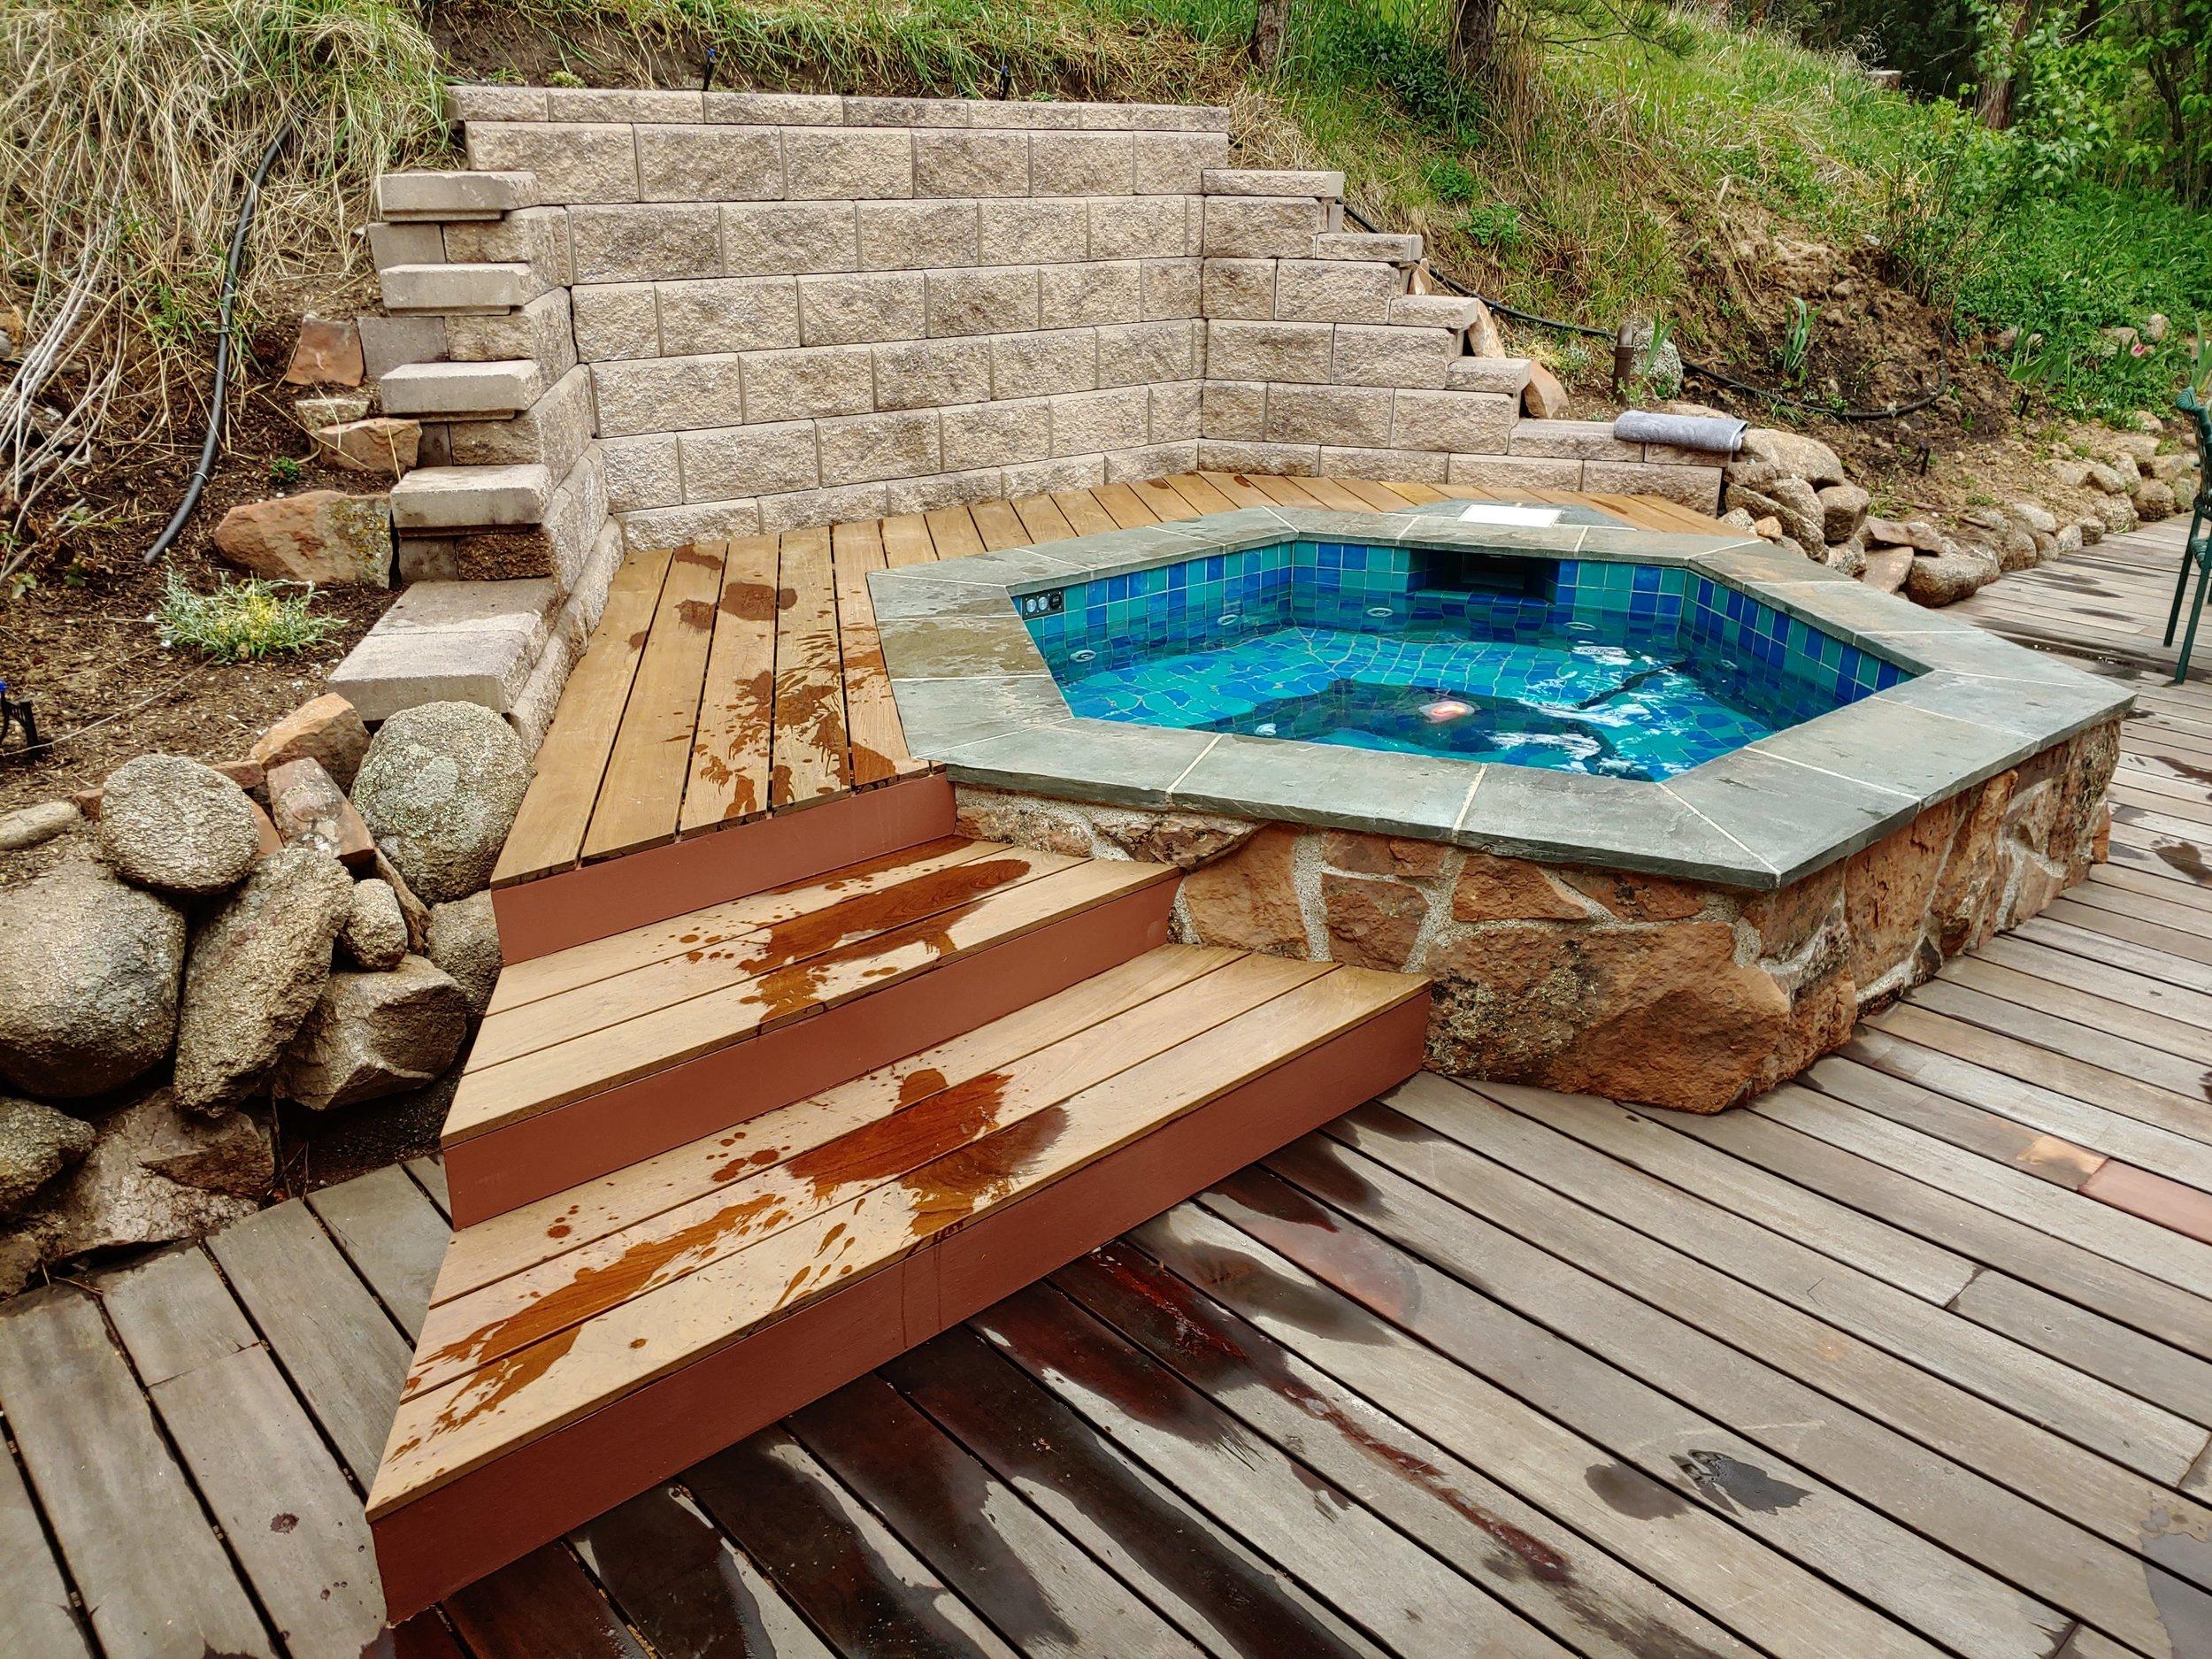 hexagonal-hot-tub-finished.jpg